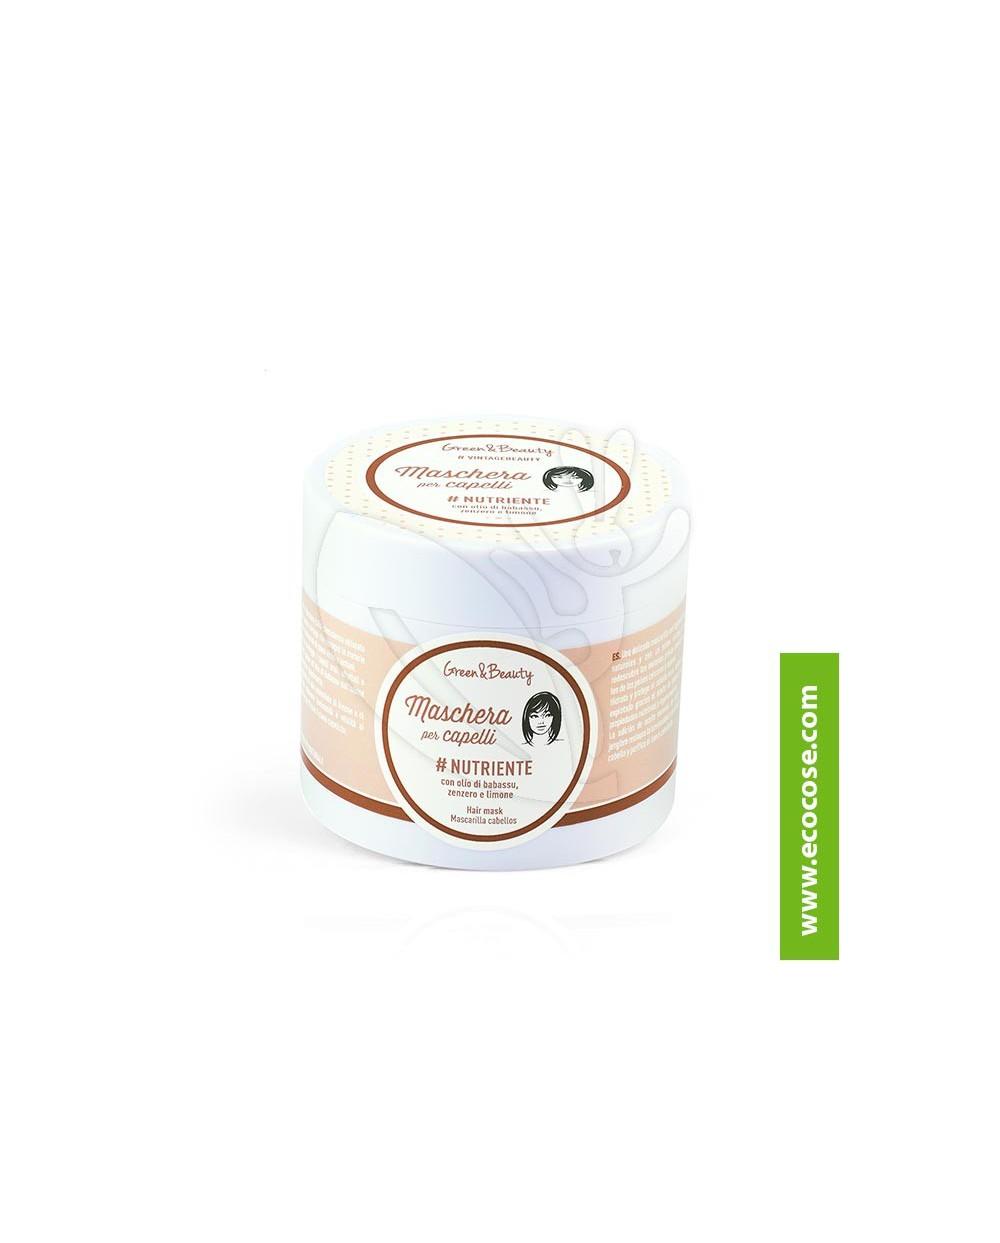 Green&Beauty - Maschera capelli Nutriente